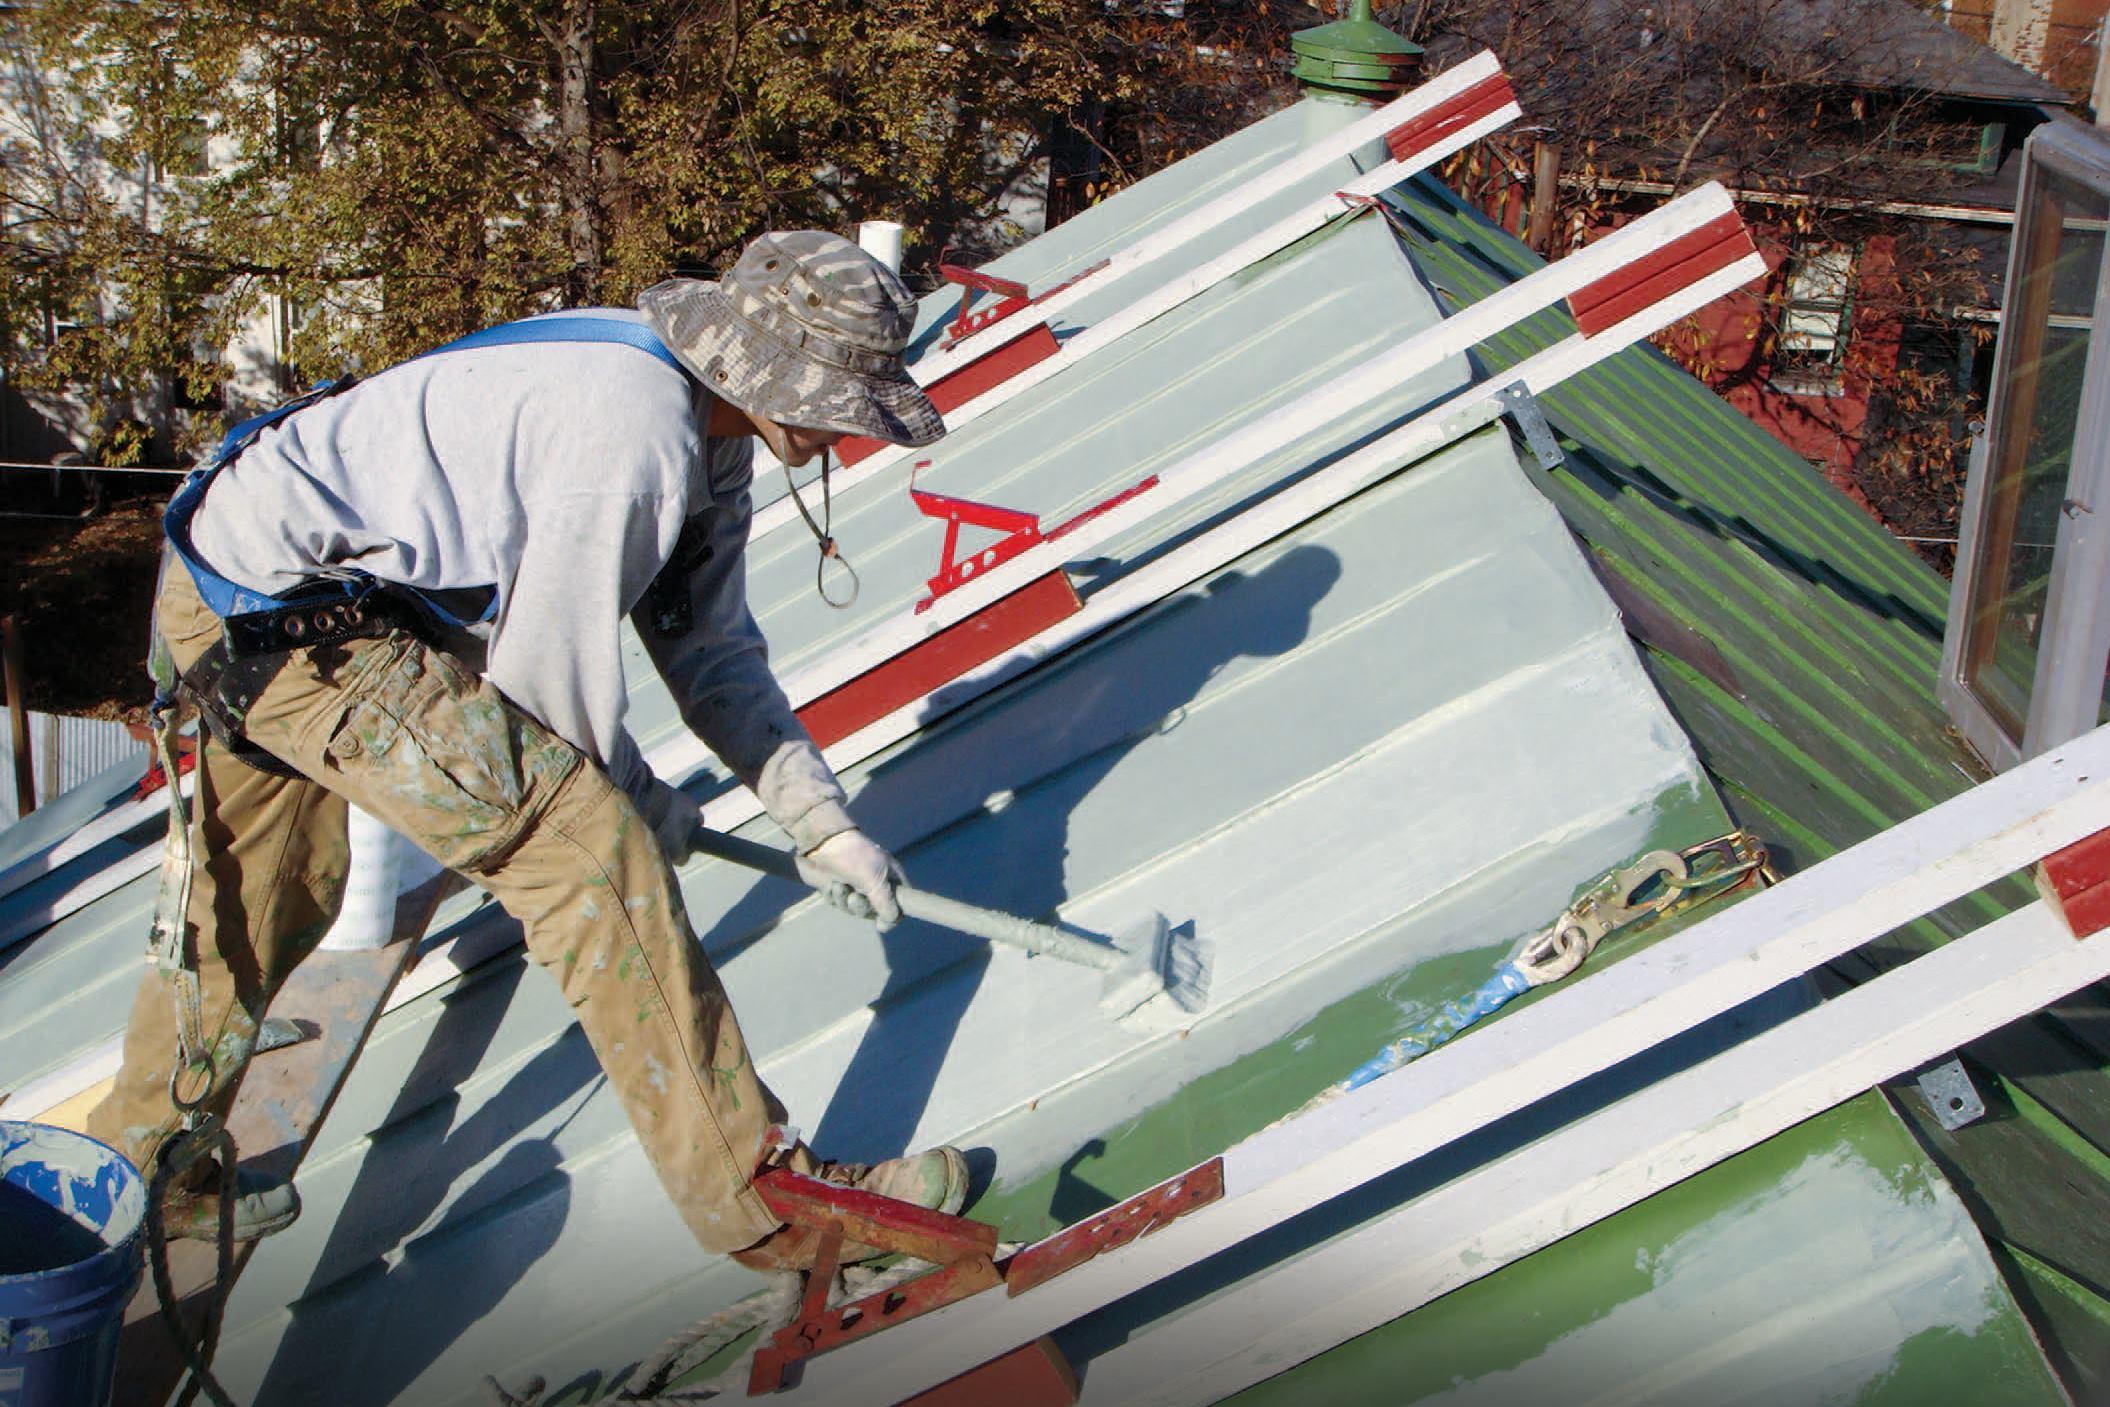 Restoring A Standing Seam Roof